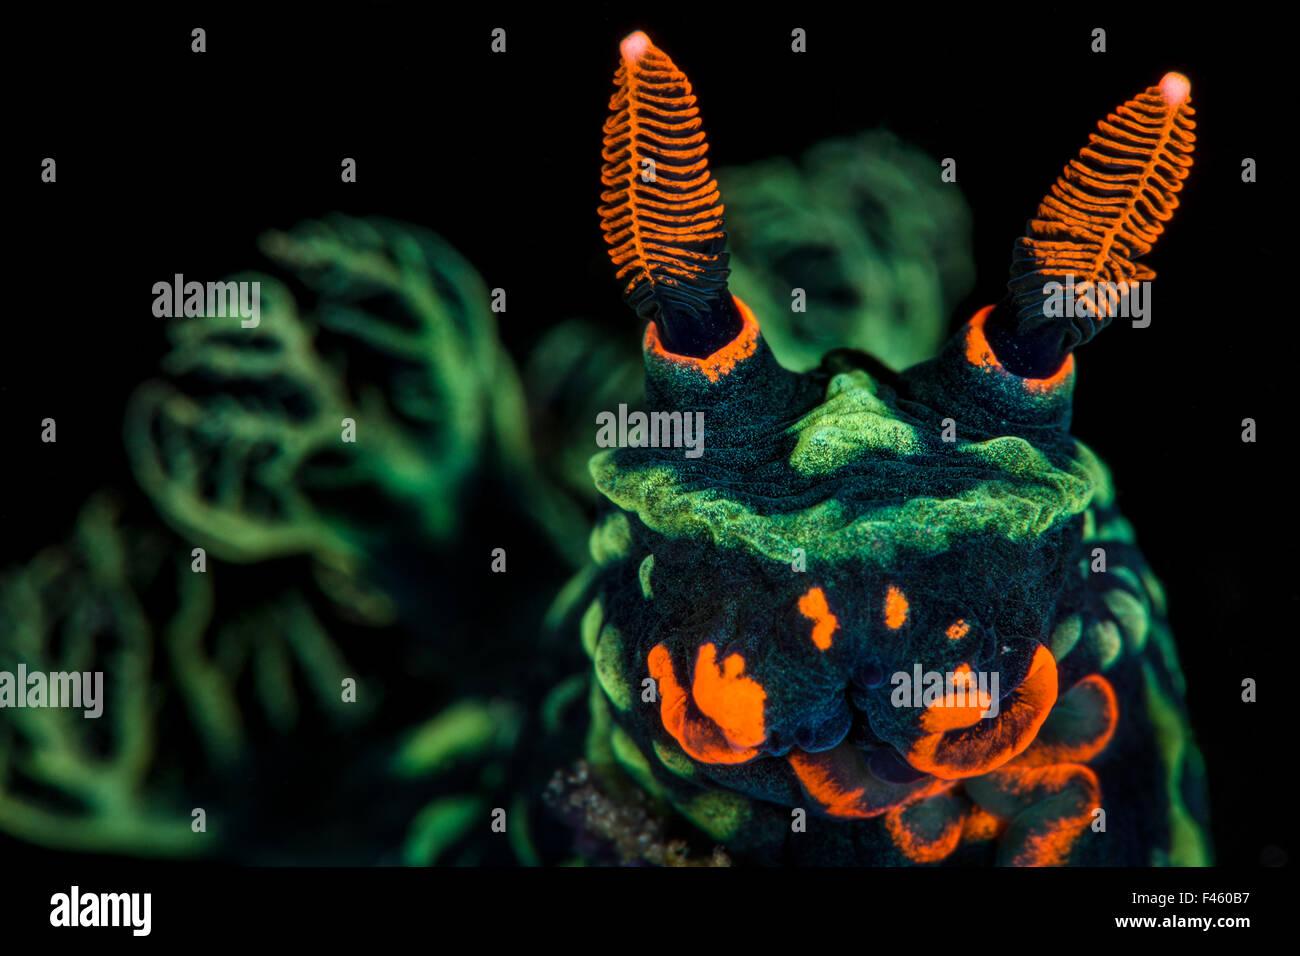 Fort agrandissement photo de nudibranche (Nembrotha kubaryana), montrant des pièces buccales et orange, vert Photo Stock